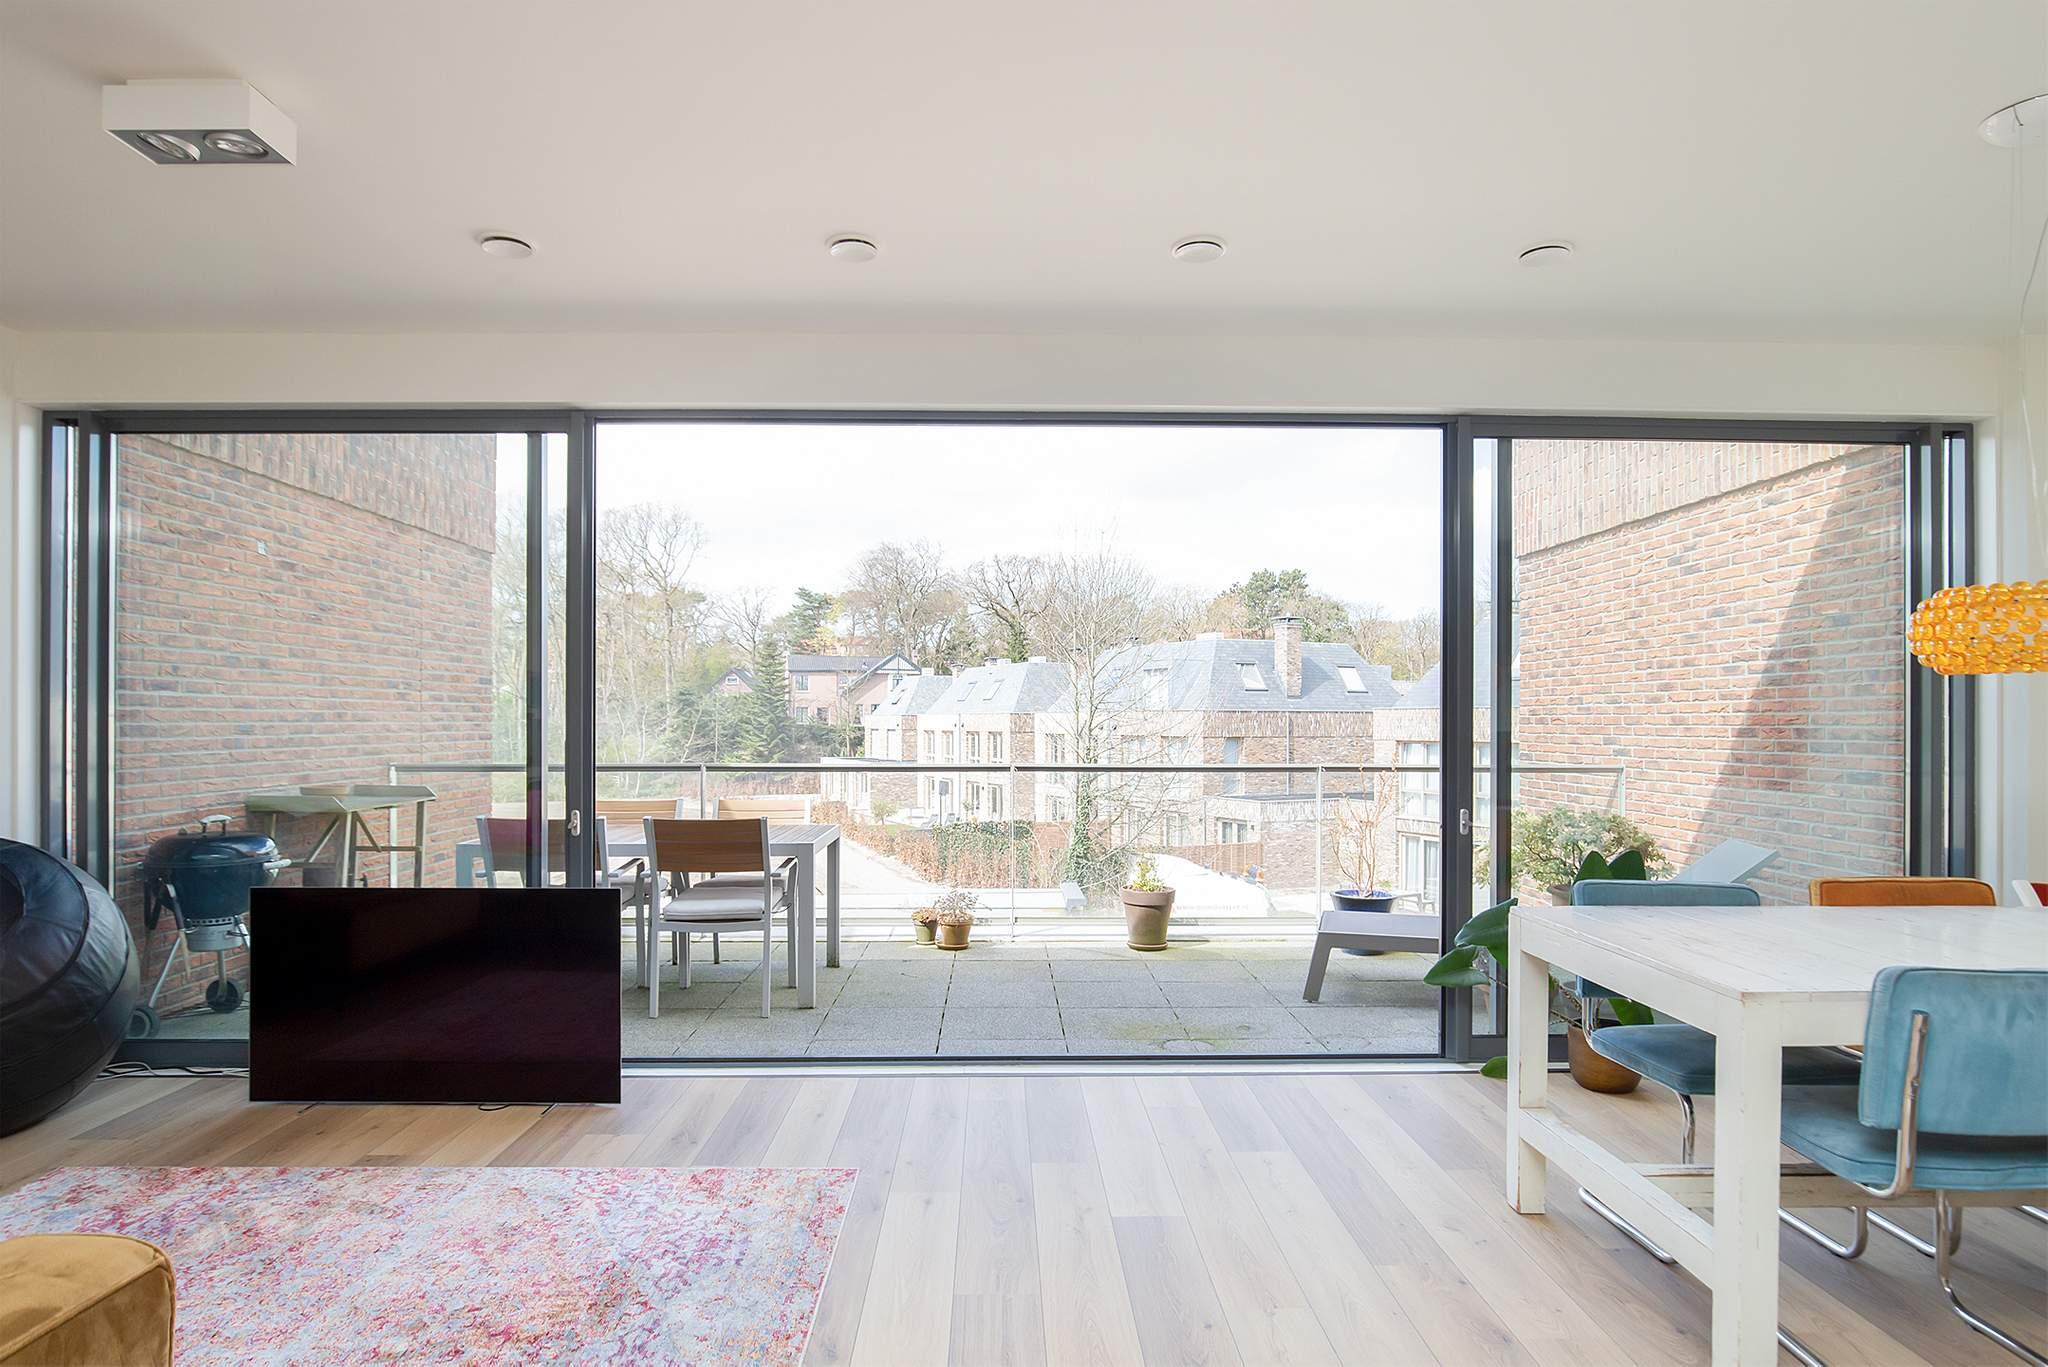 Te huur : Appartement Blekersveld 28 in Santpoort-Zuid